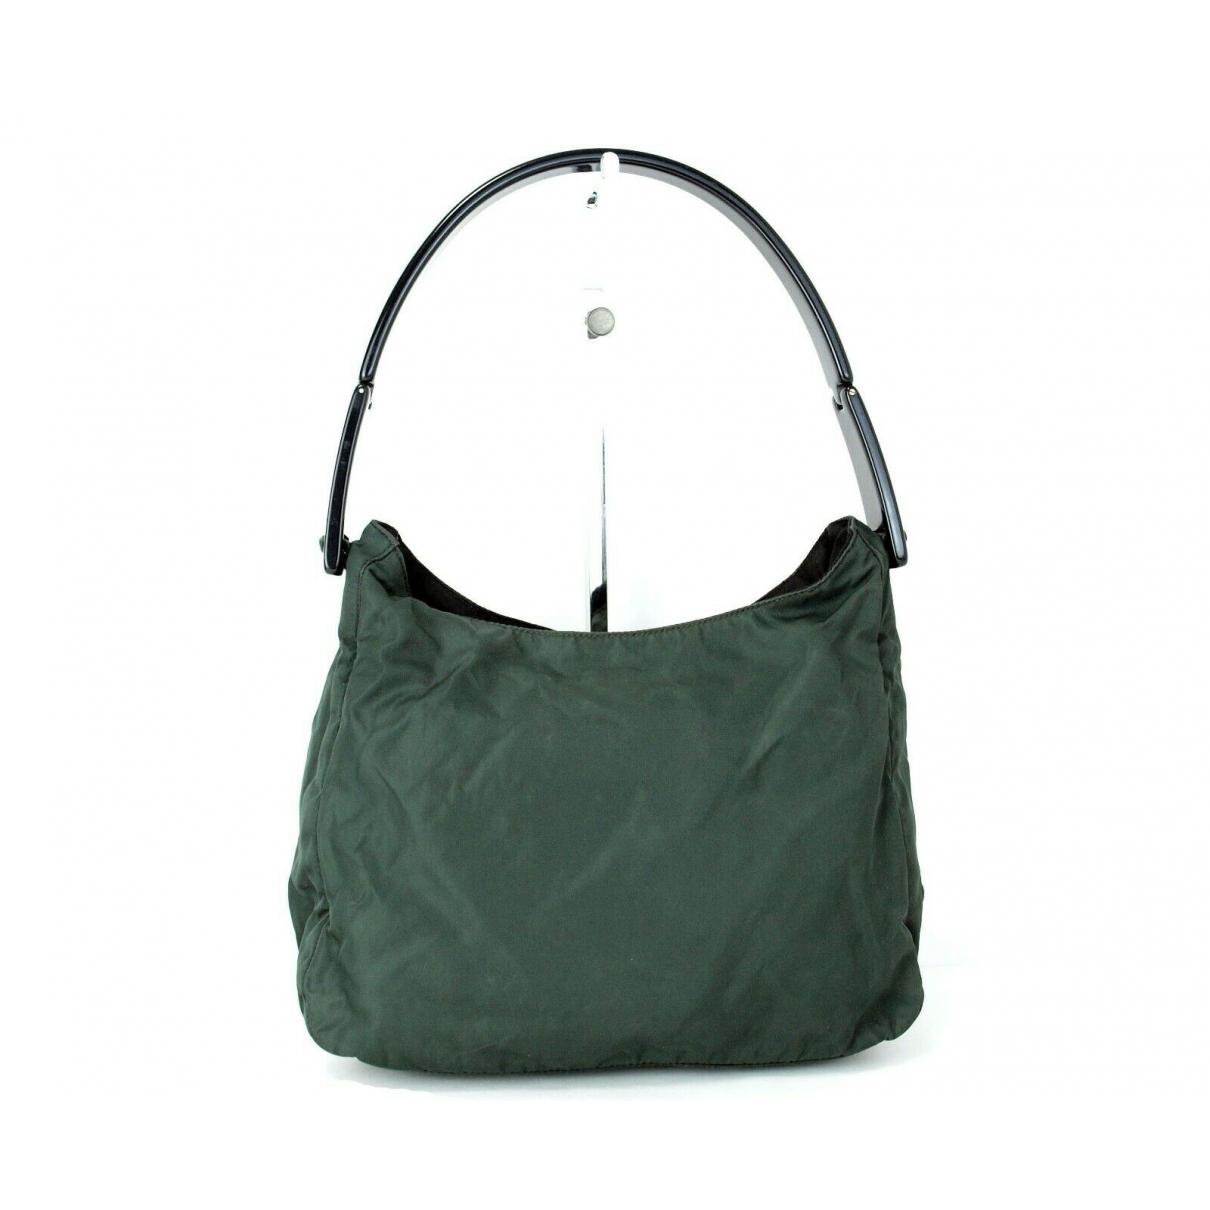 Prada \N Green Leather handbag for Women \N